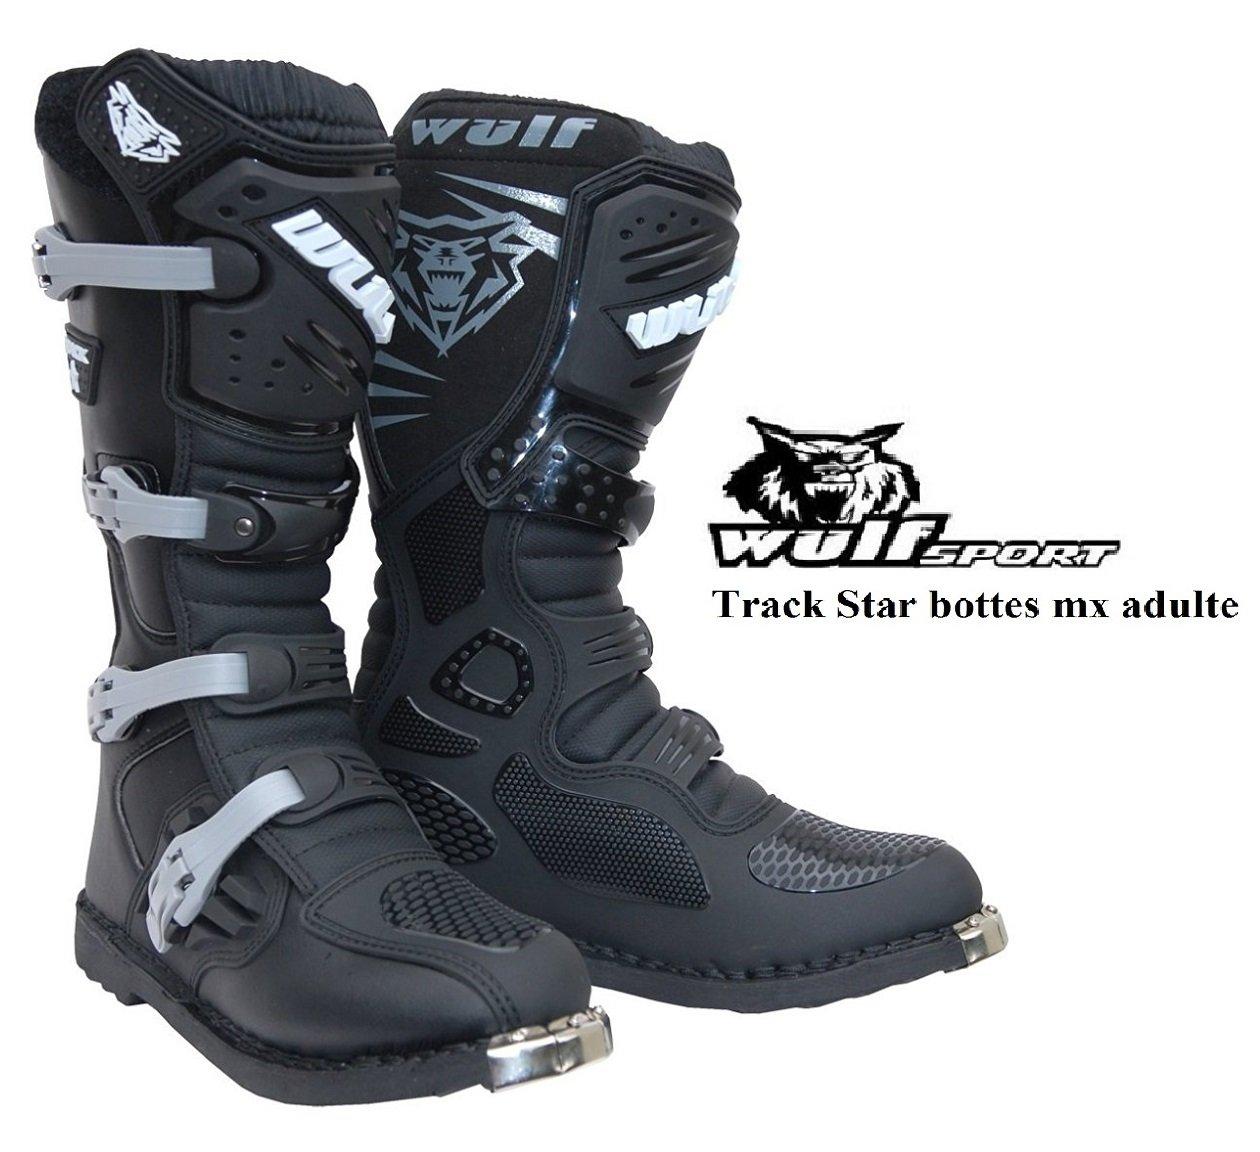 EU 44, Blanc Bottes Moto Adultes WULF Track Star MX Motocross Enduro Quad Course Chaussures Nouvelles 2016